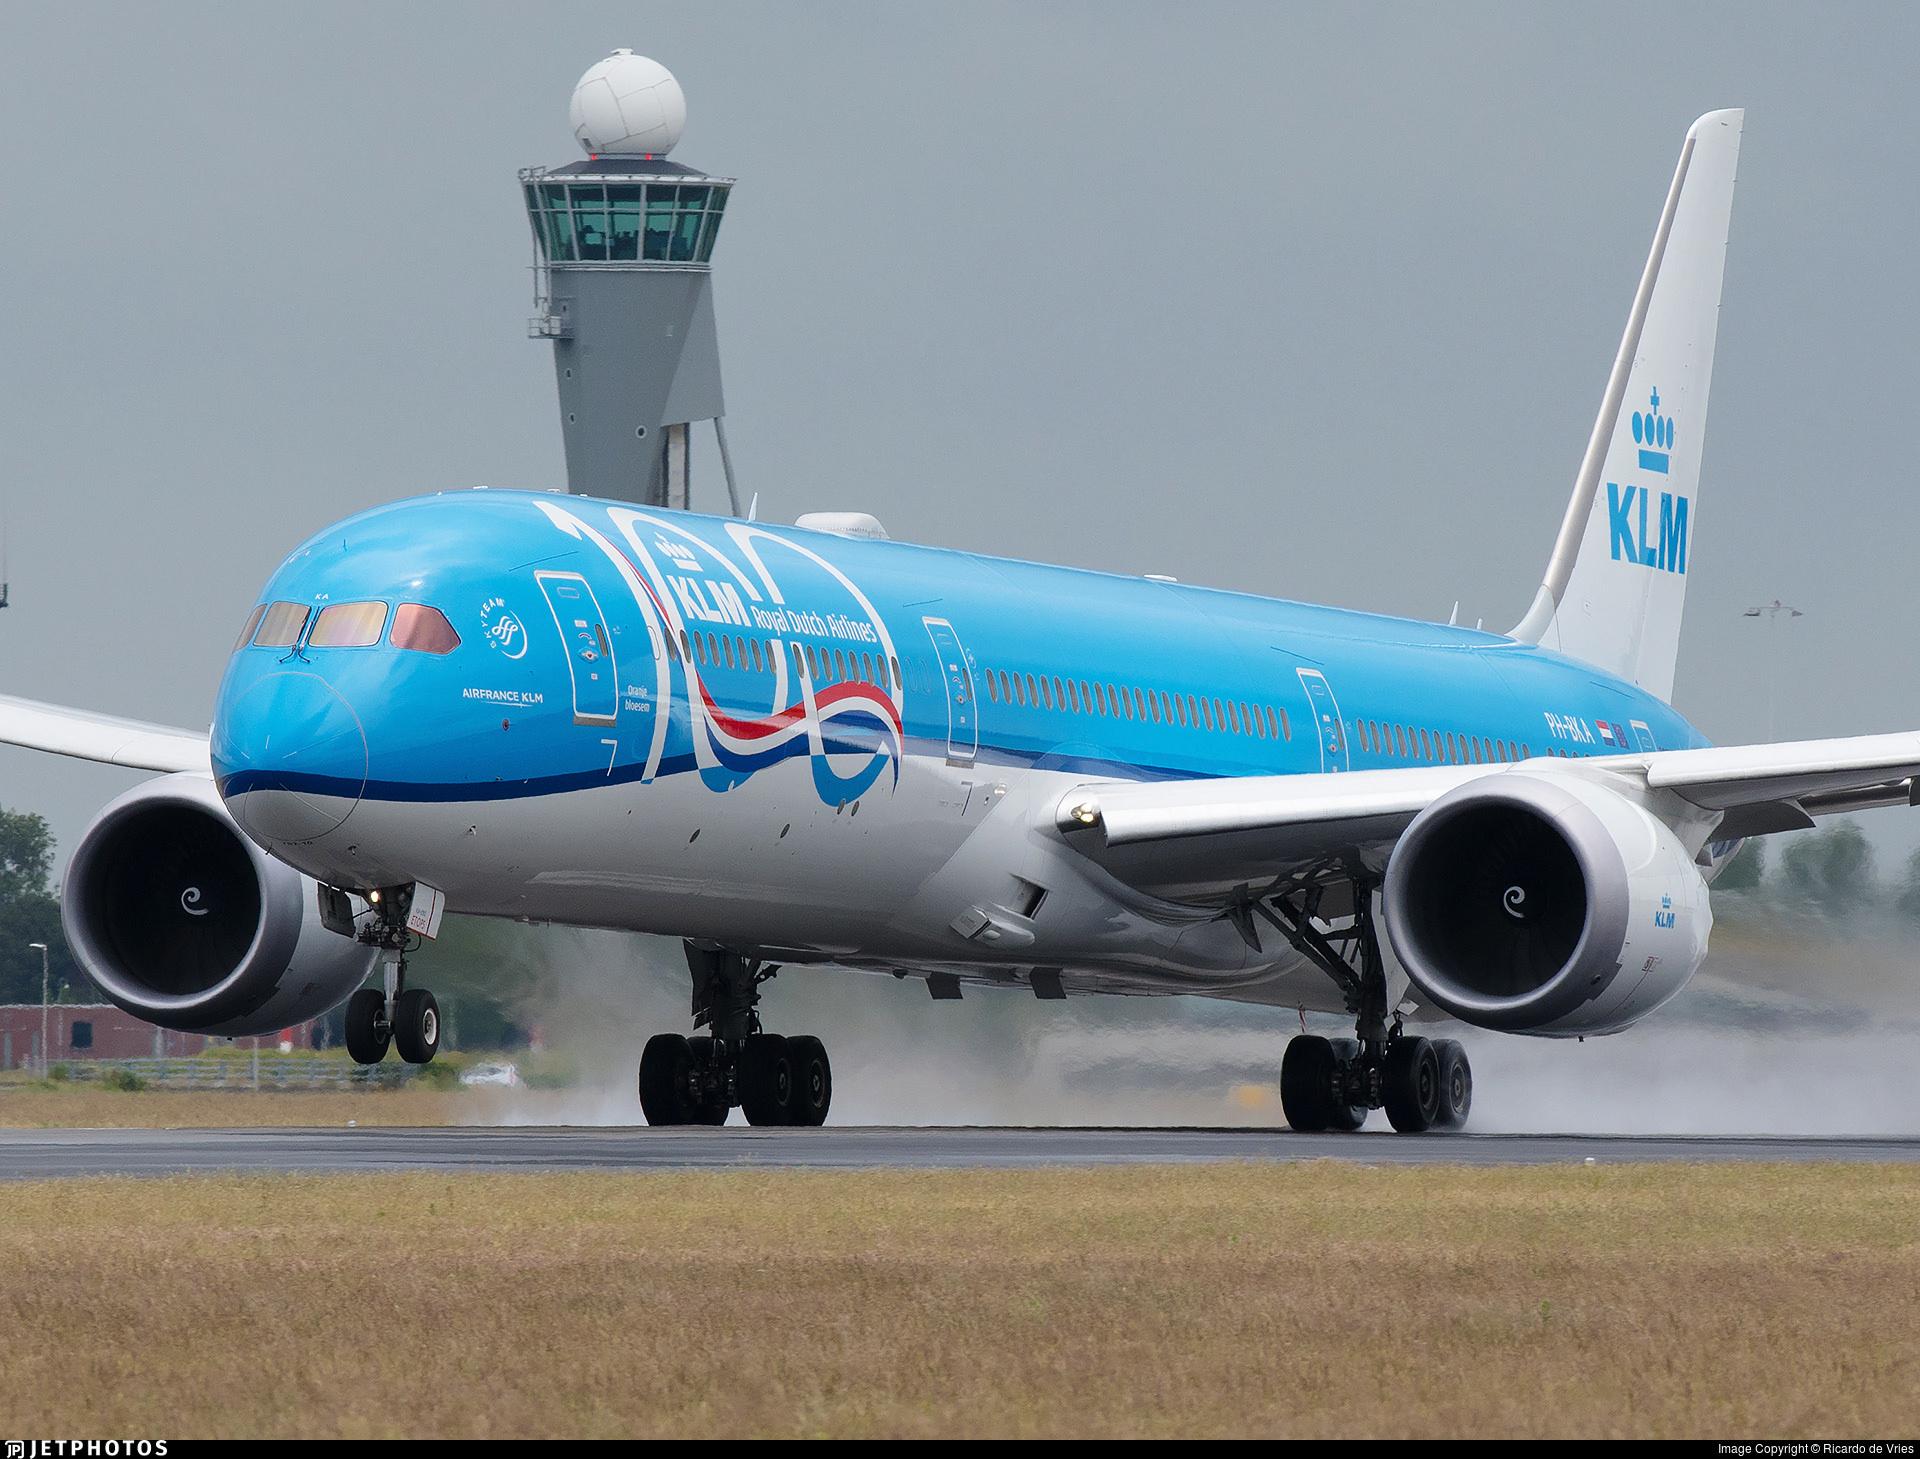 KLM's 100th anniversary 787